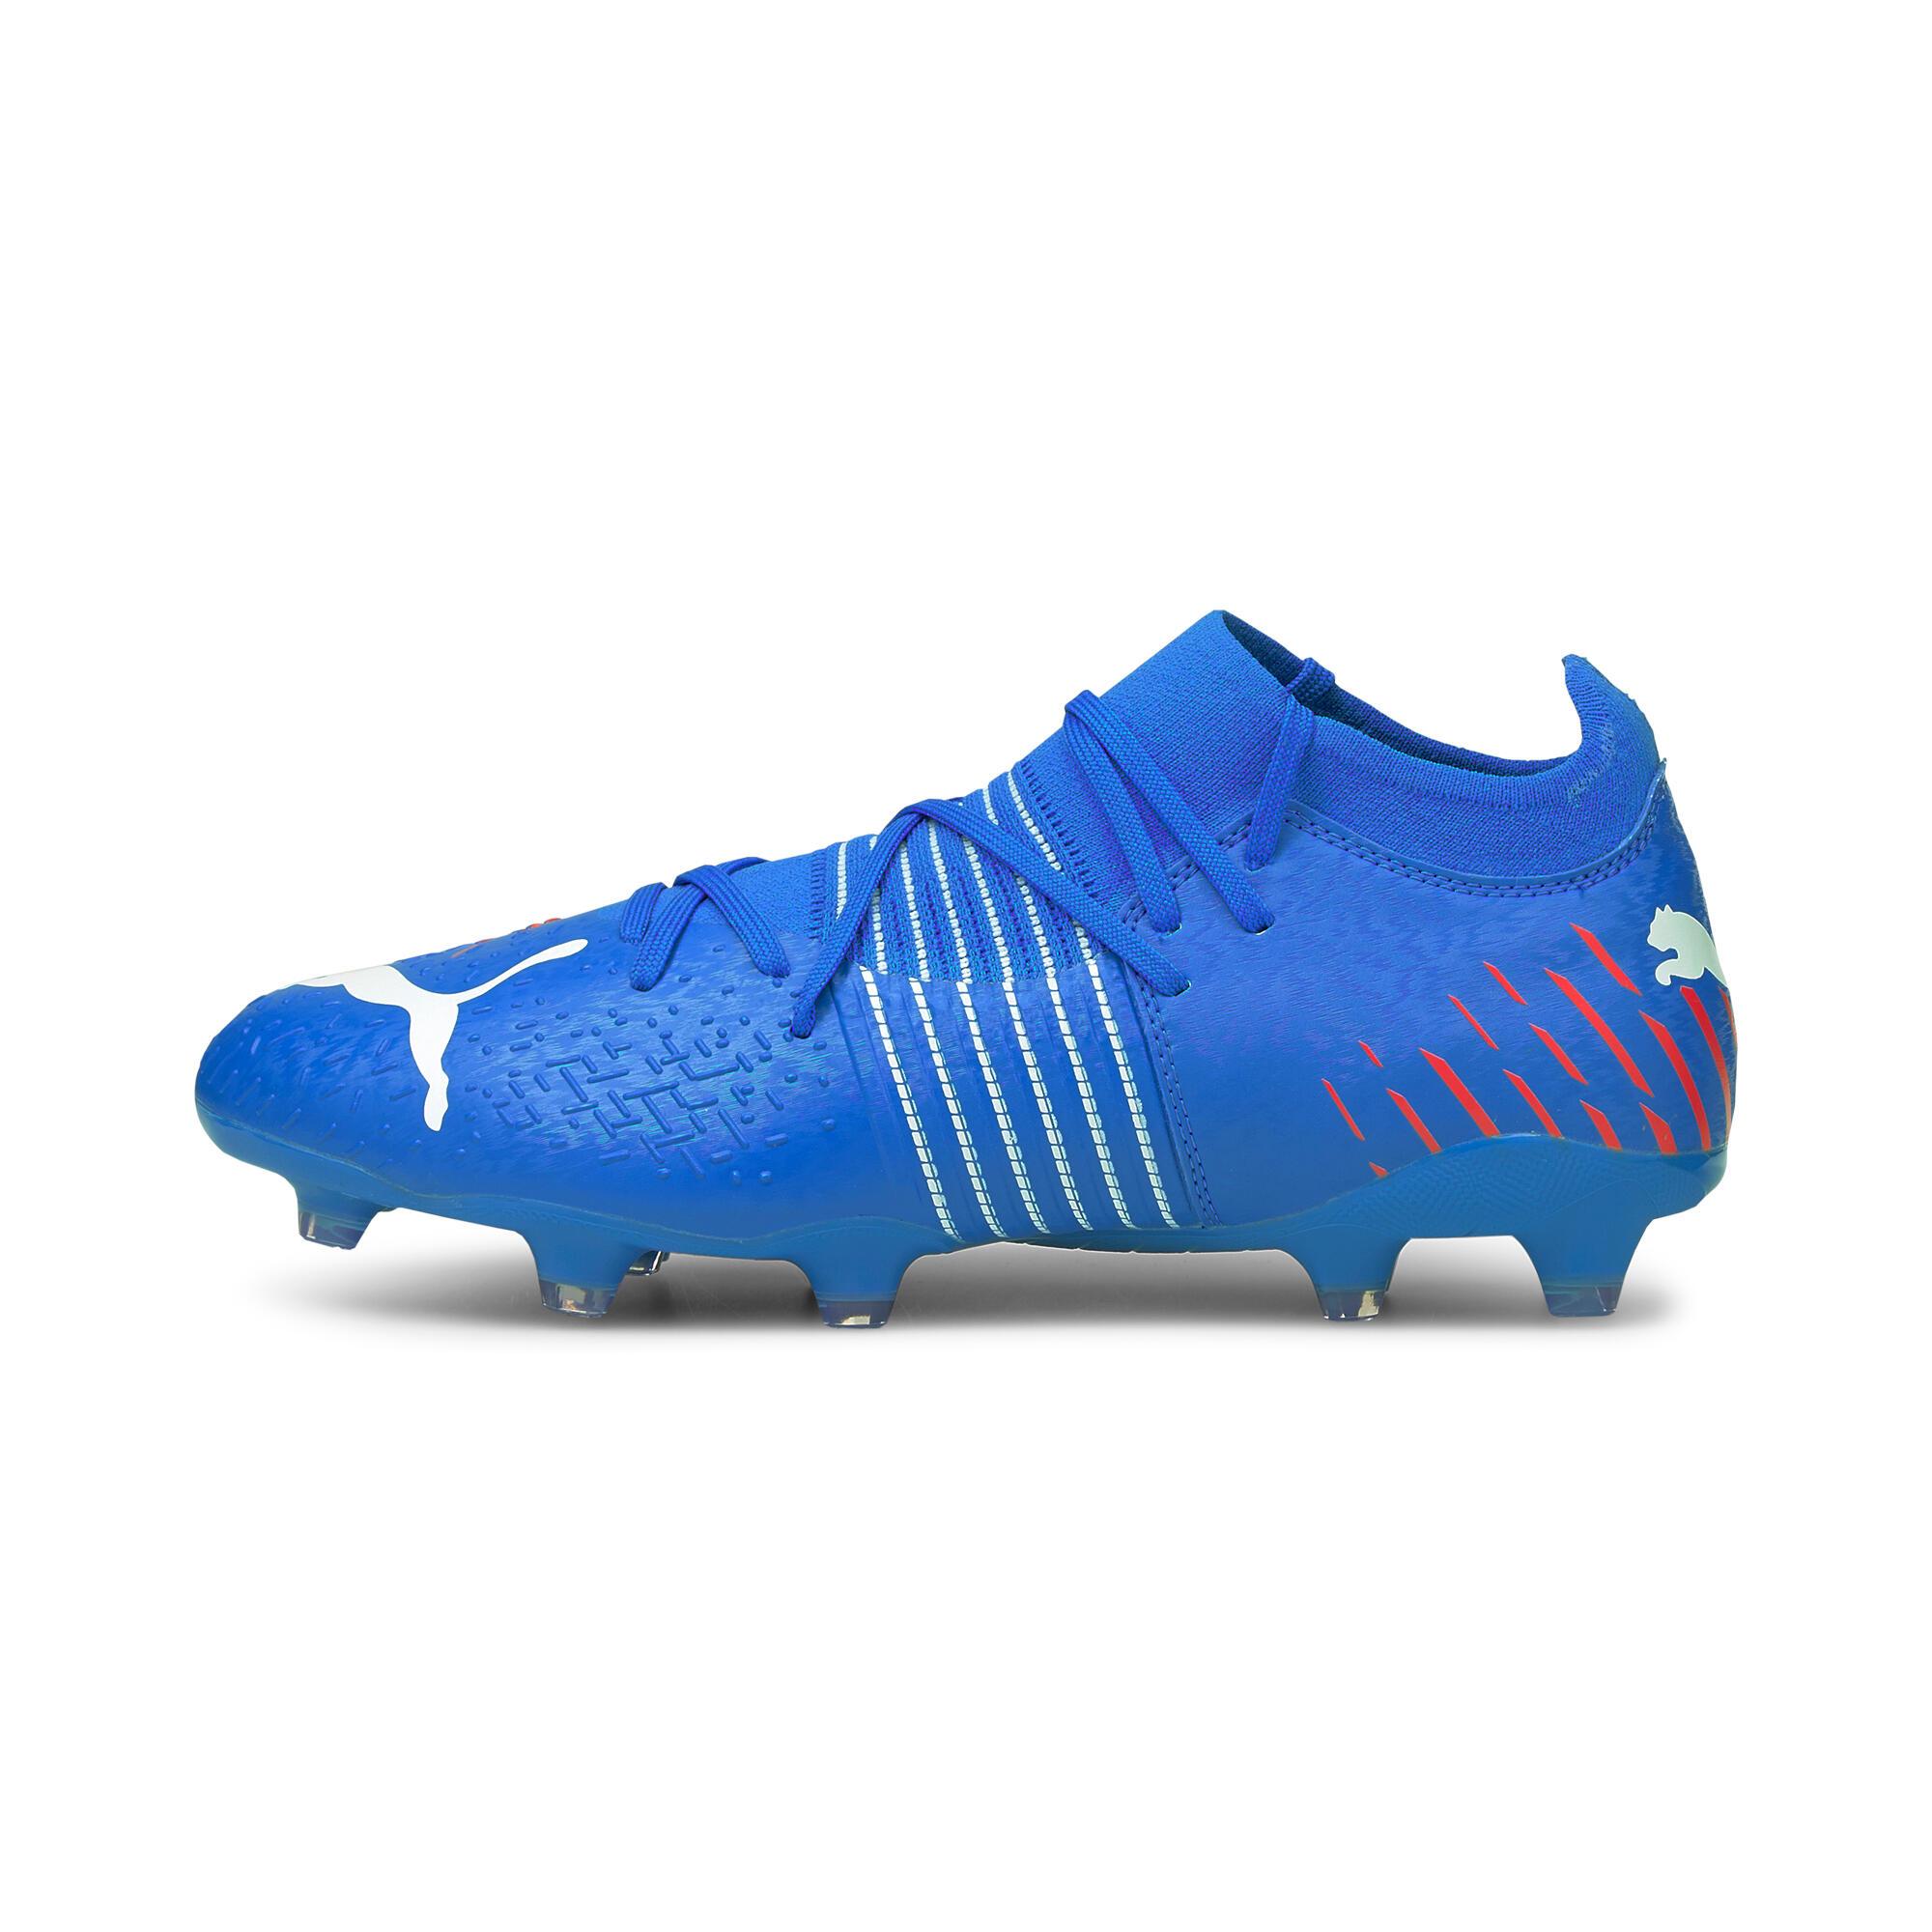 Chaussures de foot, crampons foot : Kipsta, Nike, Adidas, Puma